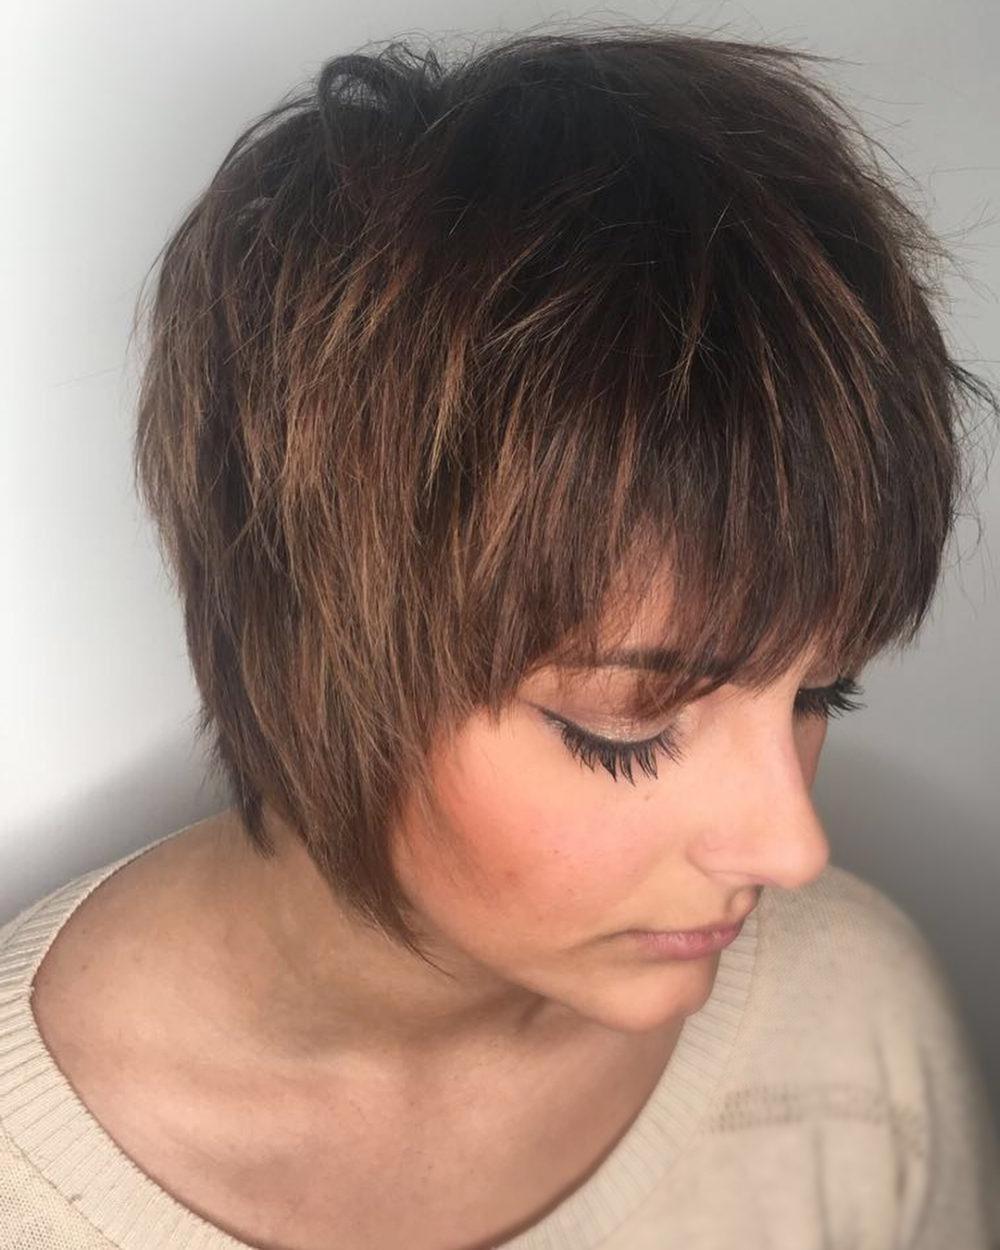 Well Known Parisian Shag Haircuts For Thin Hair For Top 25 Short Shag Haircuts Of (View 7 of 20)